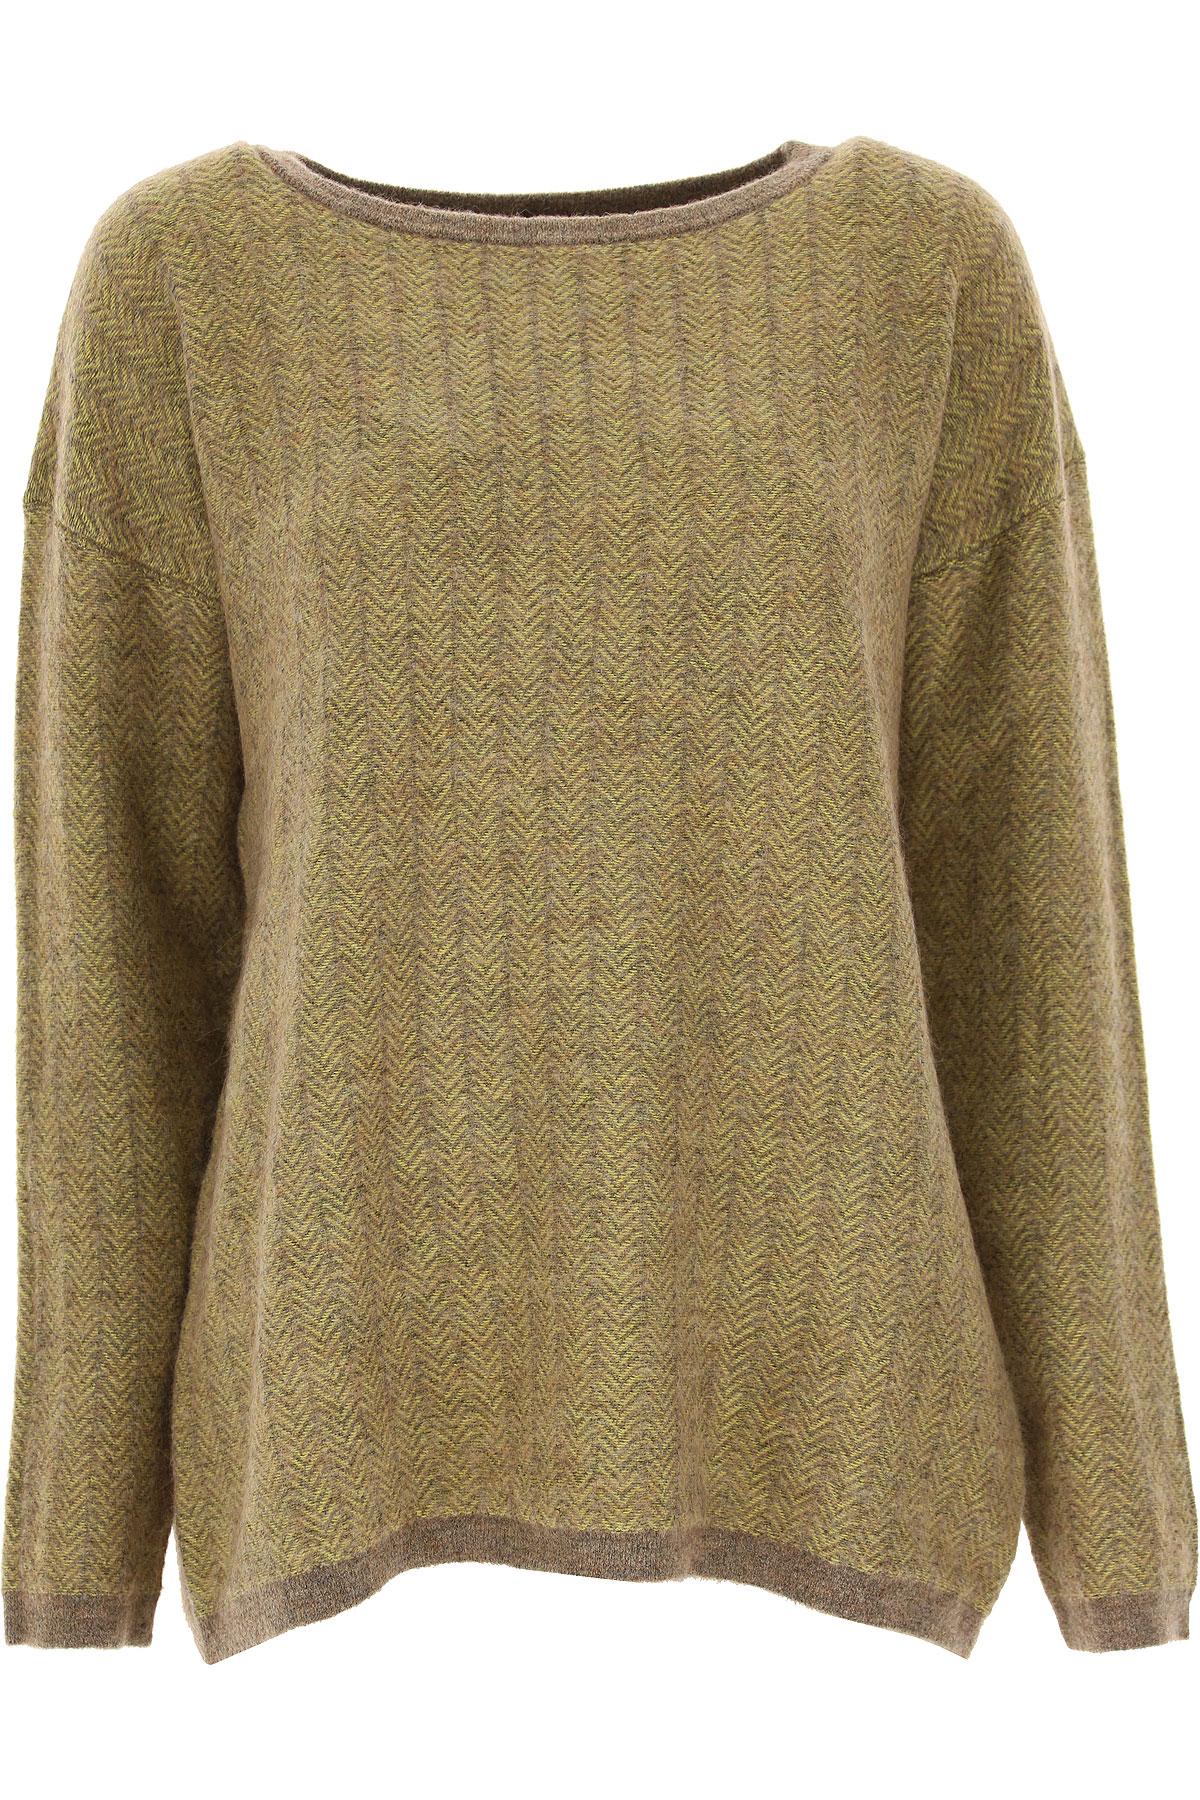 Image of Massimo Alba Sweater for Women Jumper, Yellow, Wool, 2017, 4 6 8